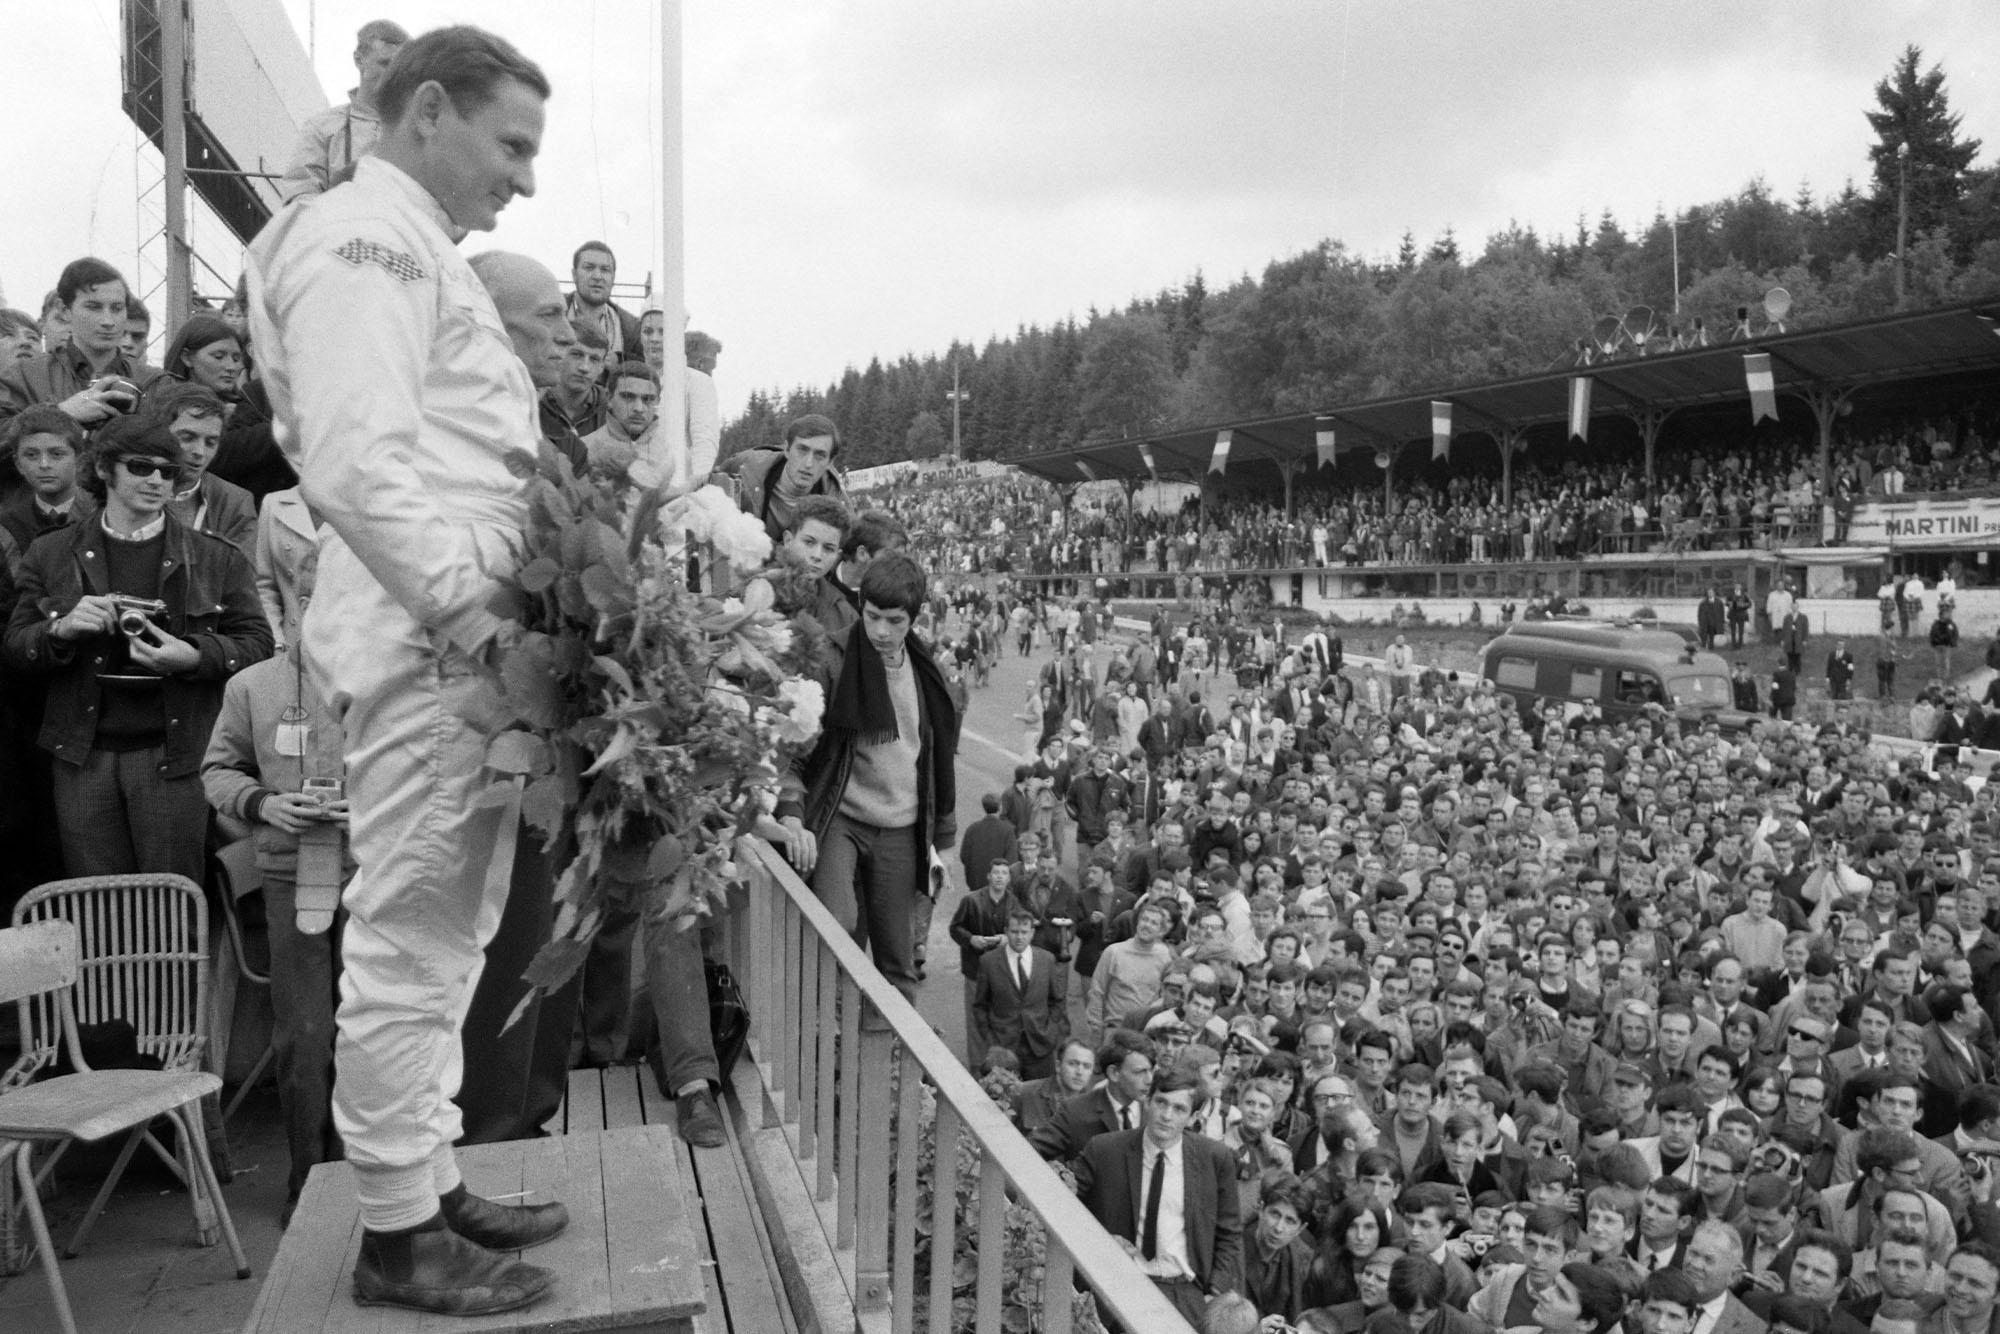 Bruce McLaren, 1st position, on the podium.